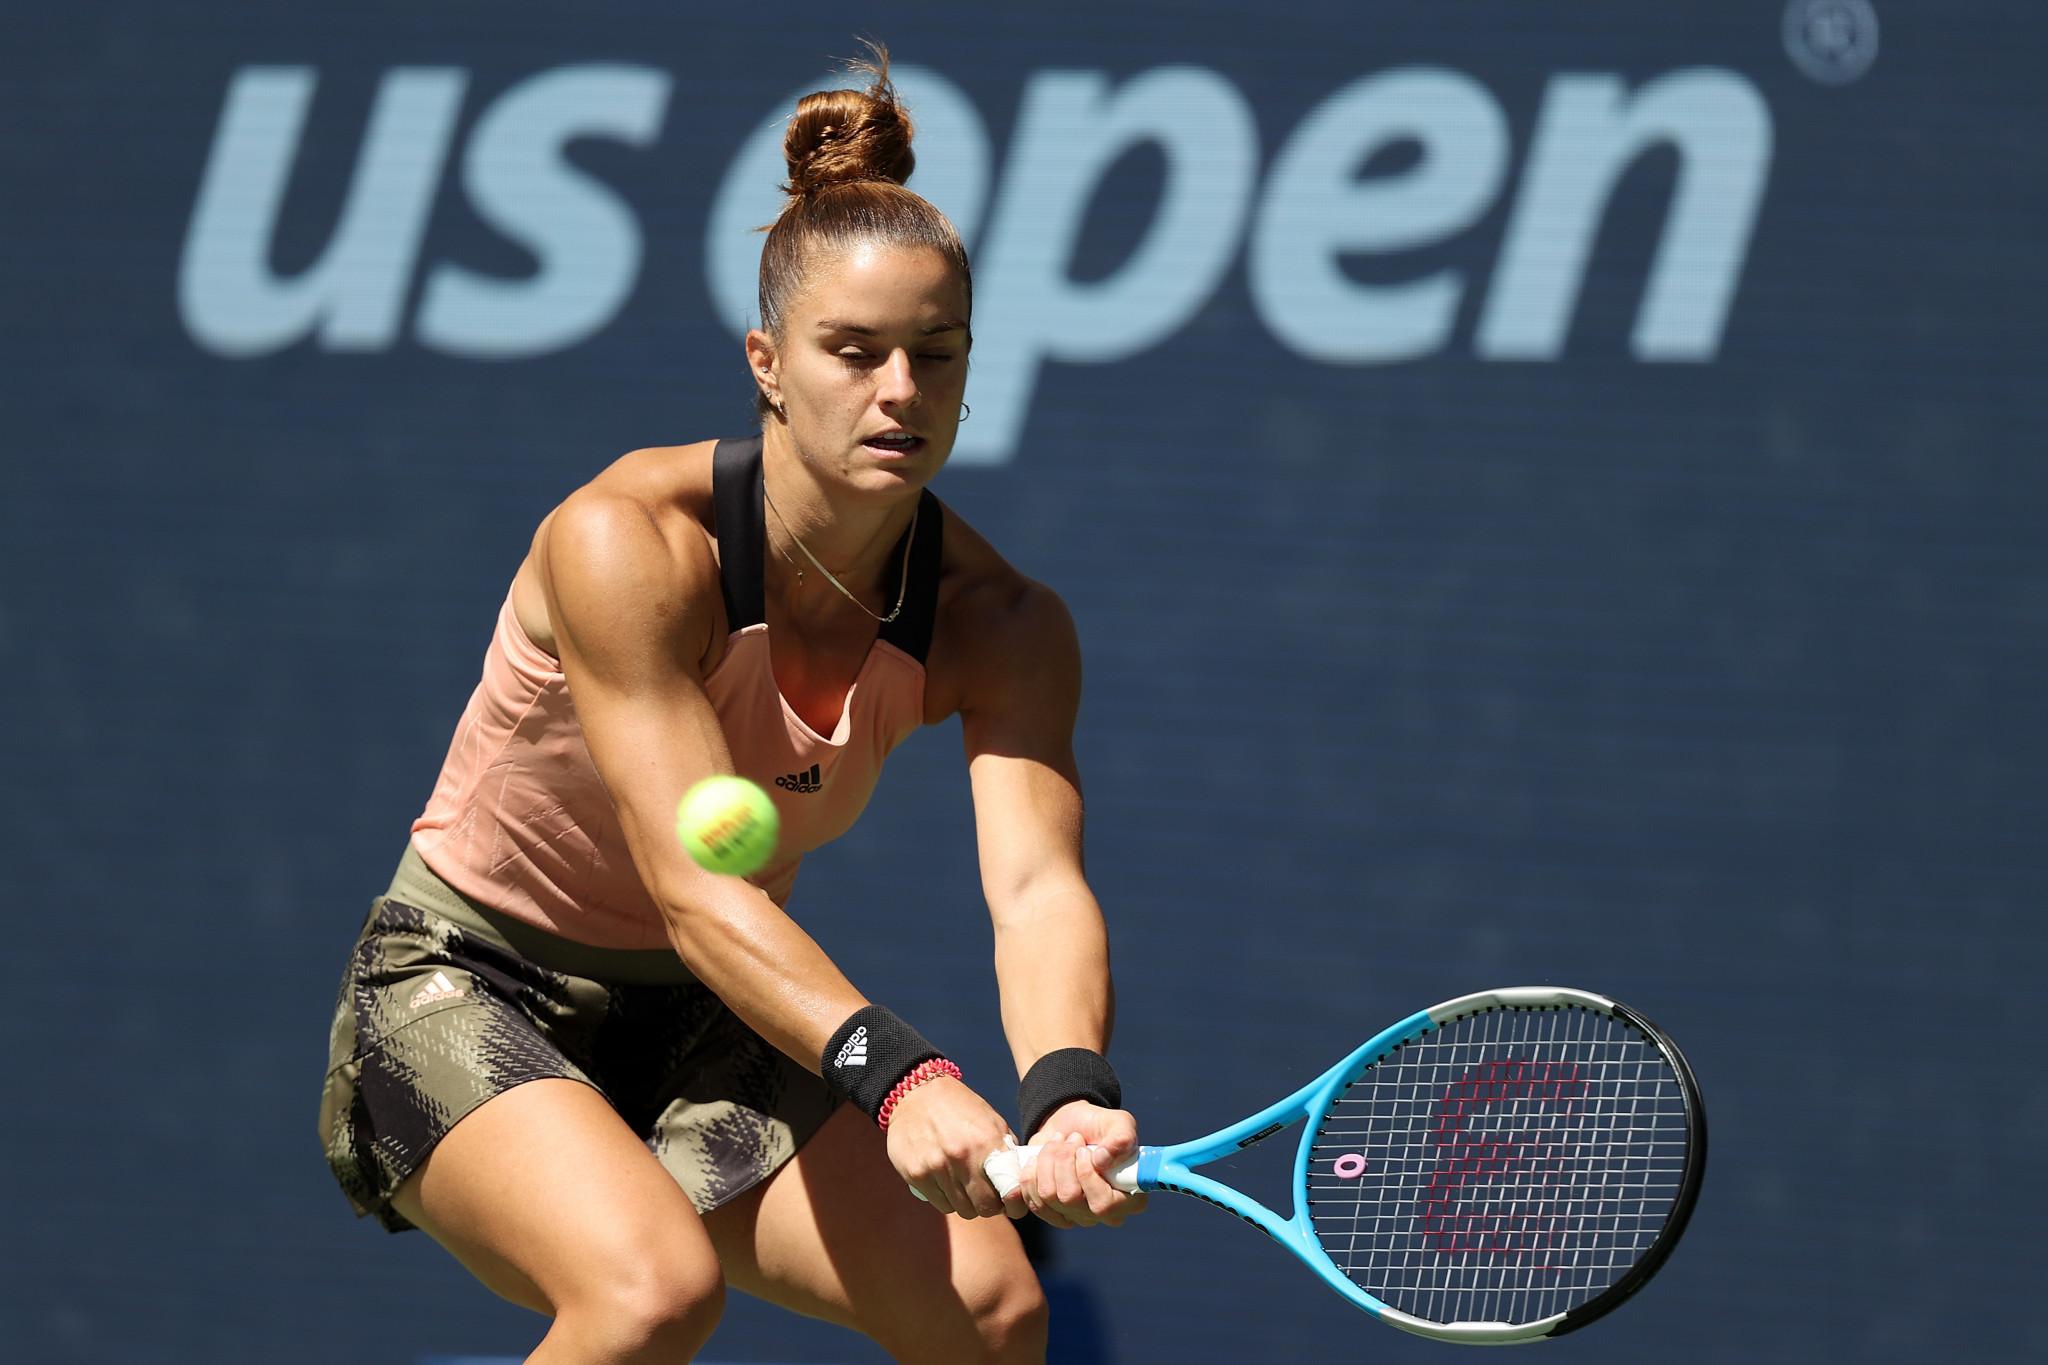 Maria Sakkari beat Petra Kvitova in straight sets in the opening match of the day on Arthur Ashe Stadium ©Getty Images